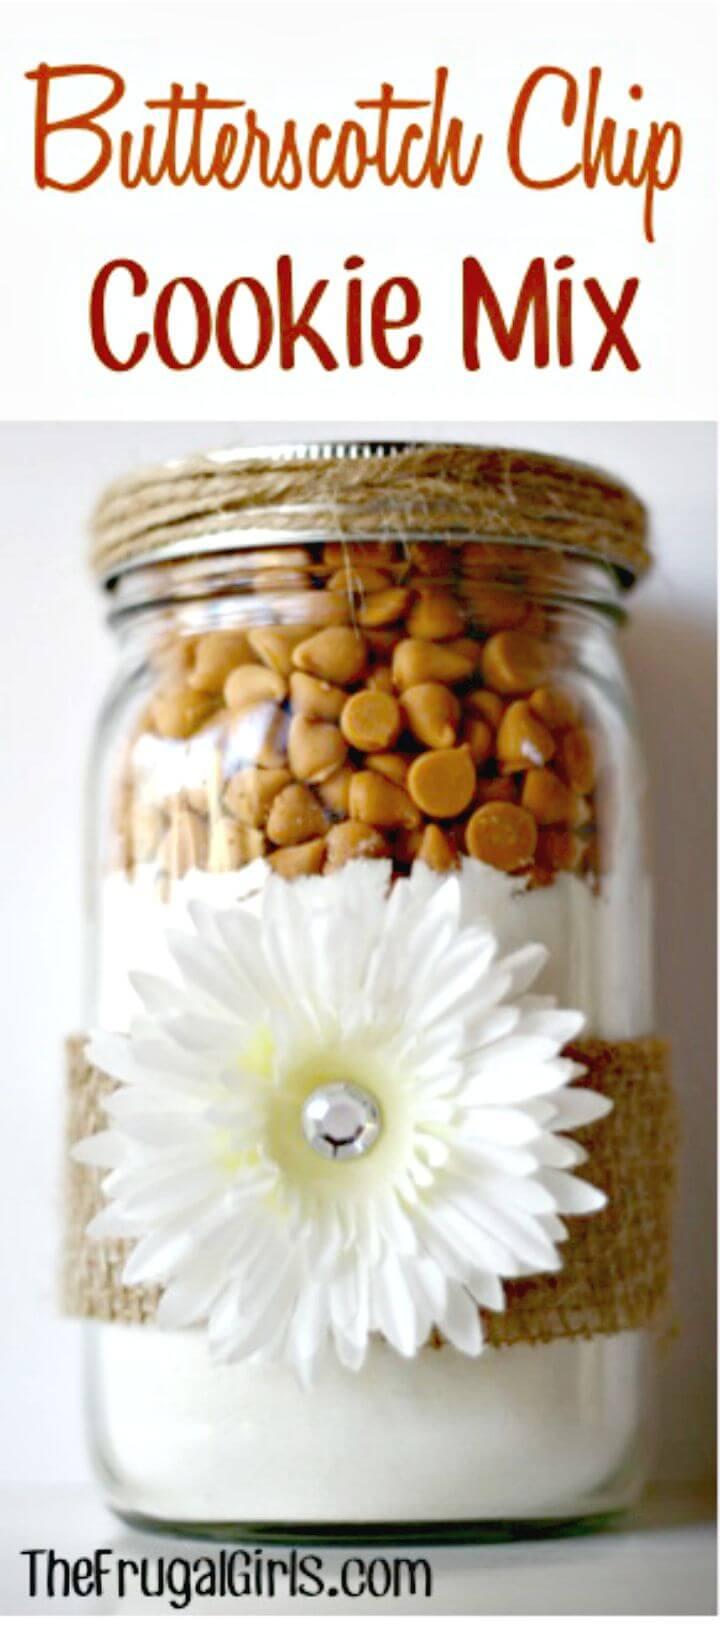 Delicious Cookie Mix Recipe In a Jar Recipe